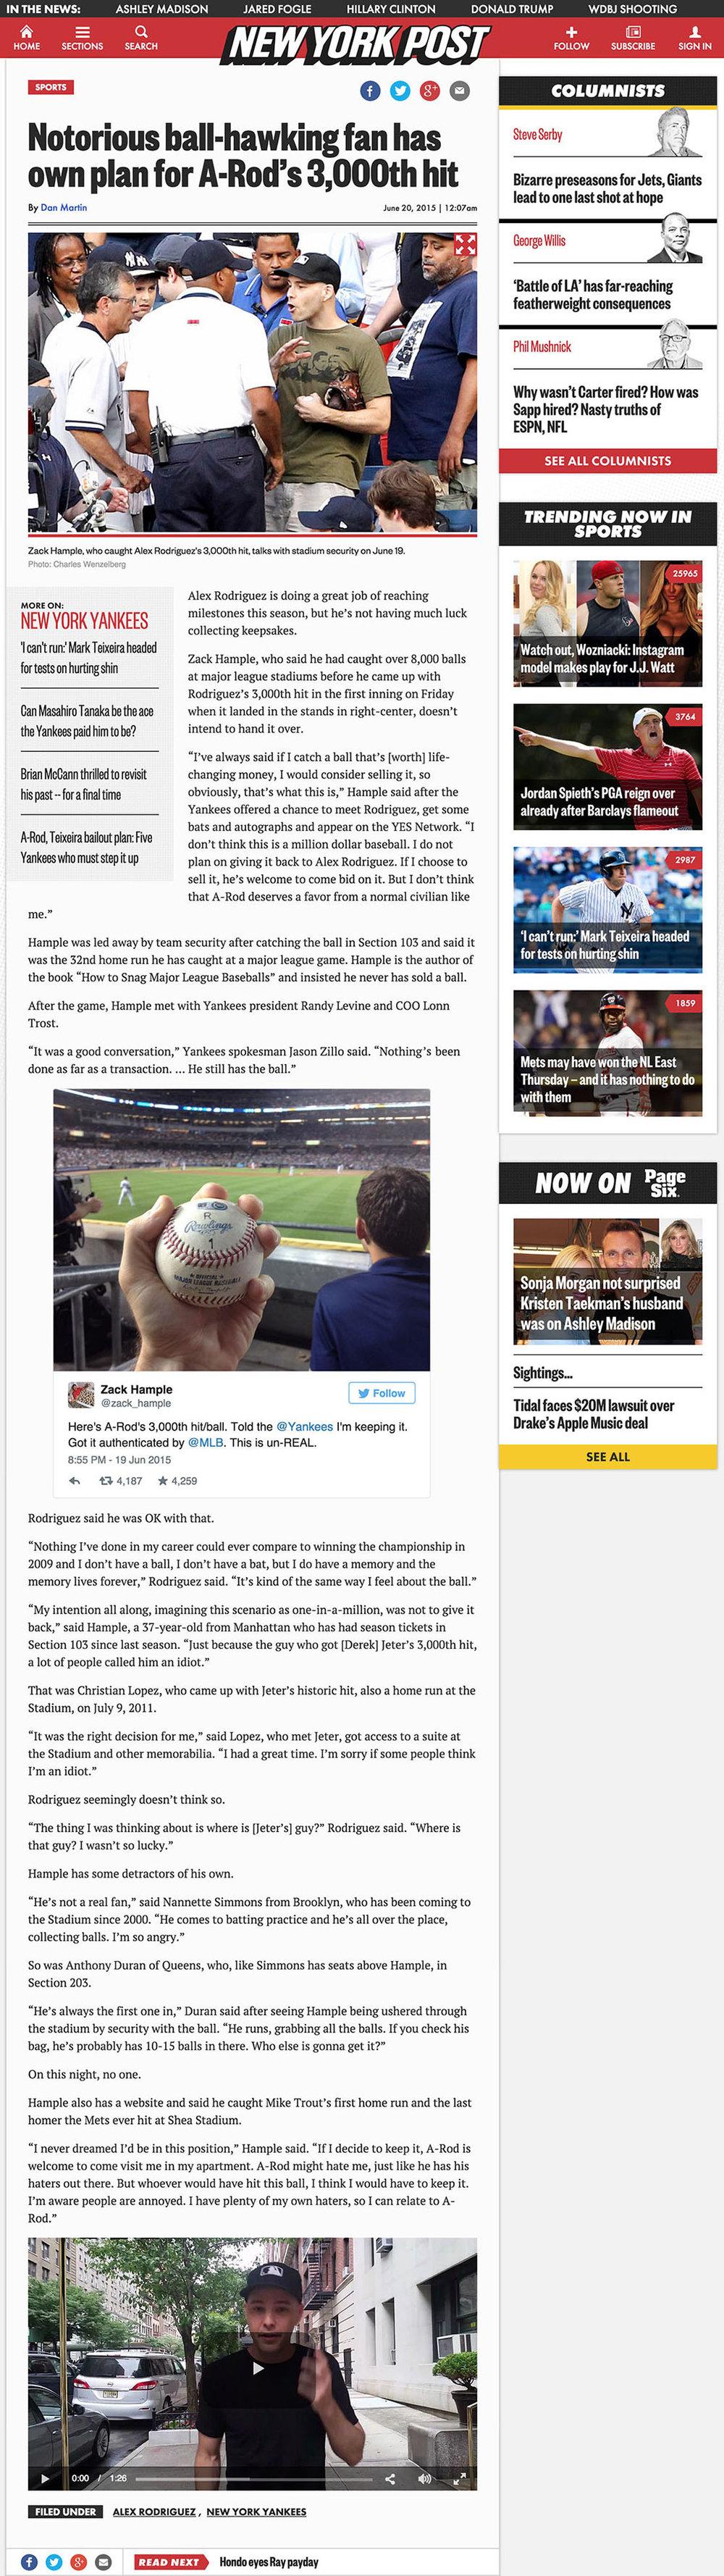 new_york_post2b.jpg